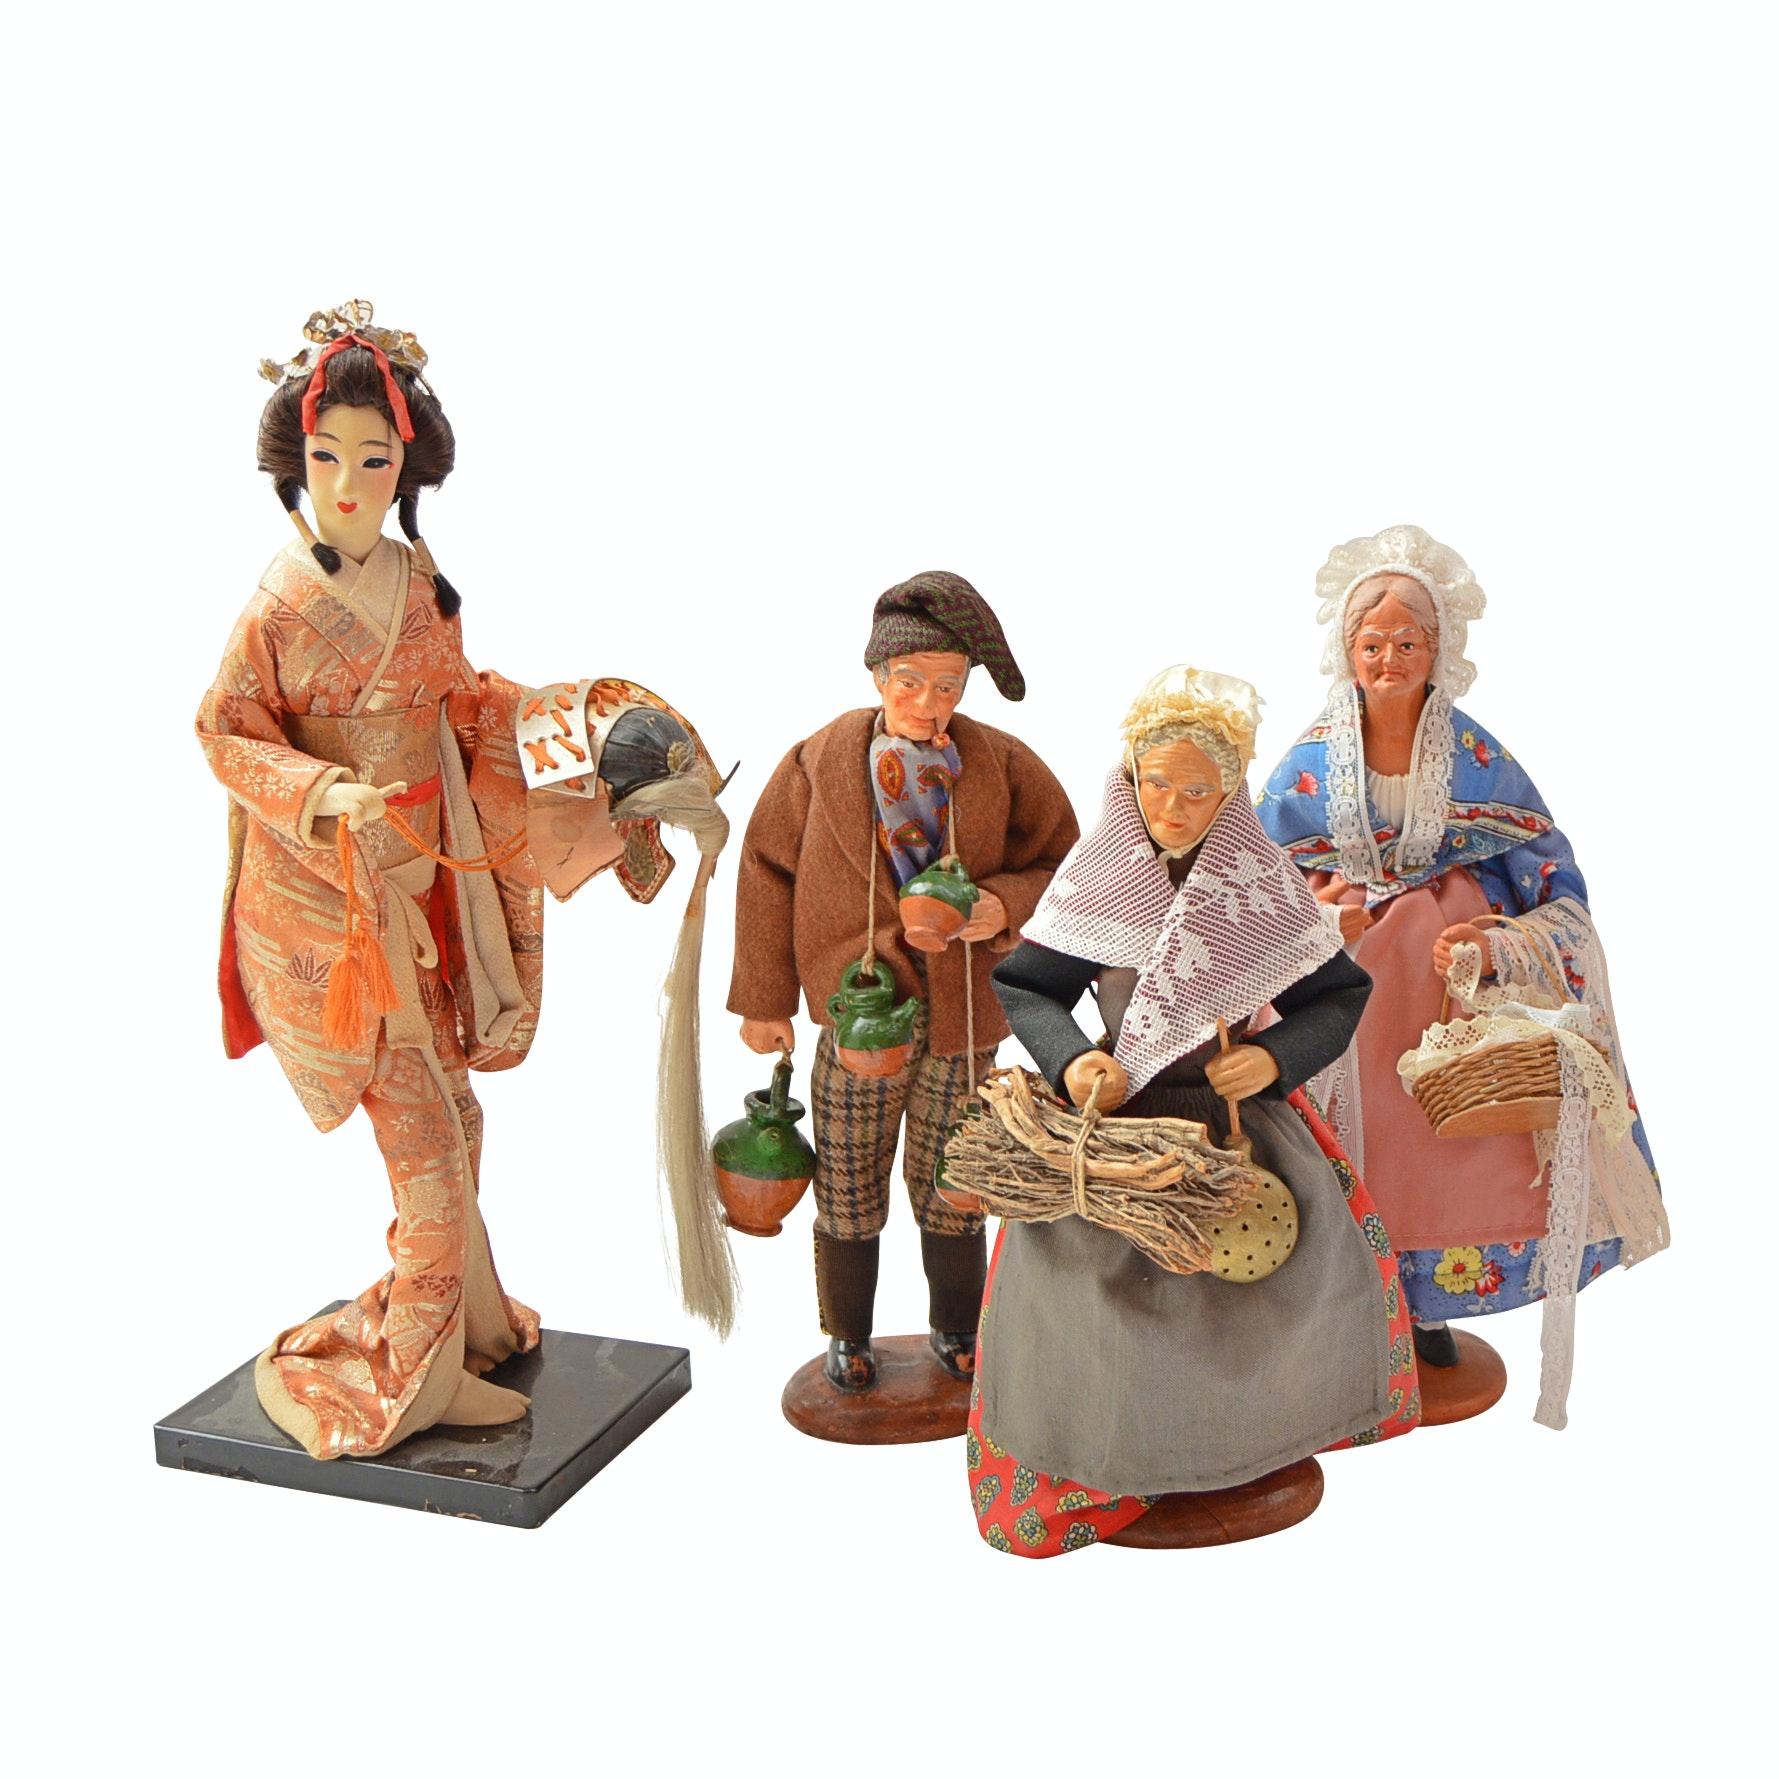 Vintage M. Chave Aubagne Terra Cotta Dolls, Plus Japanese Doll